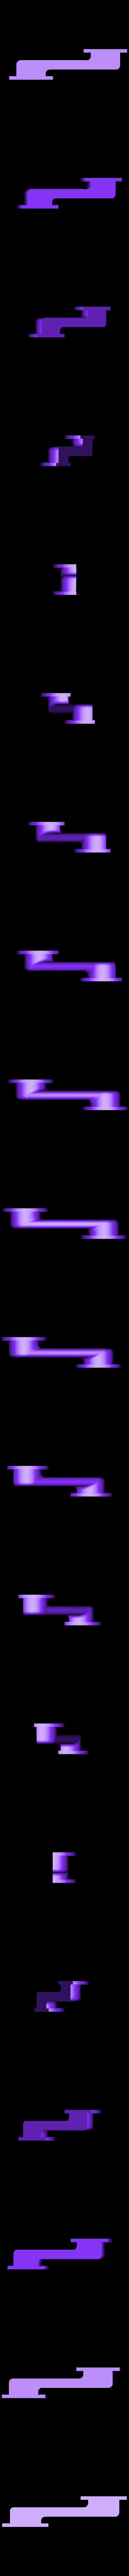 Steam_Pipe_Elbow_1-b.STL Download free STL file 4-8-8-4 Big Boy Locomotive • 3D printer object, RaymondDeLuca